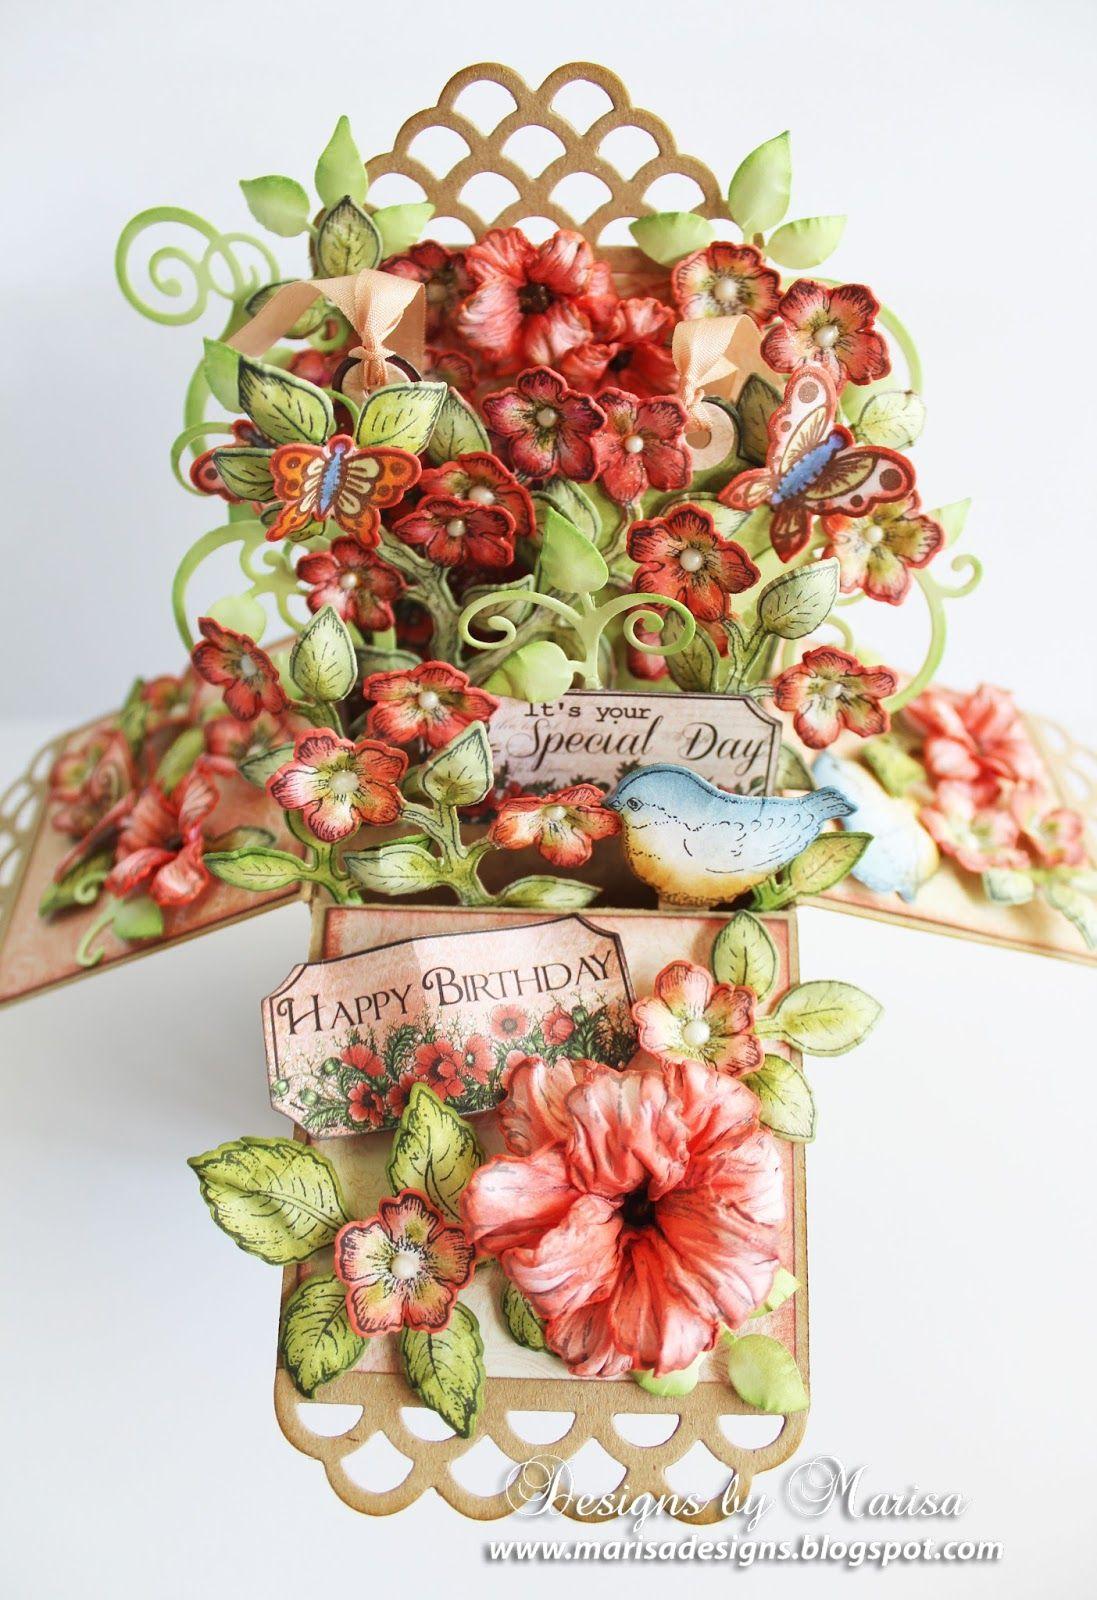 Designs by Marisa: Heartfelt Creations - Happy Birthday Pop Up Box Card Tutorial